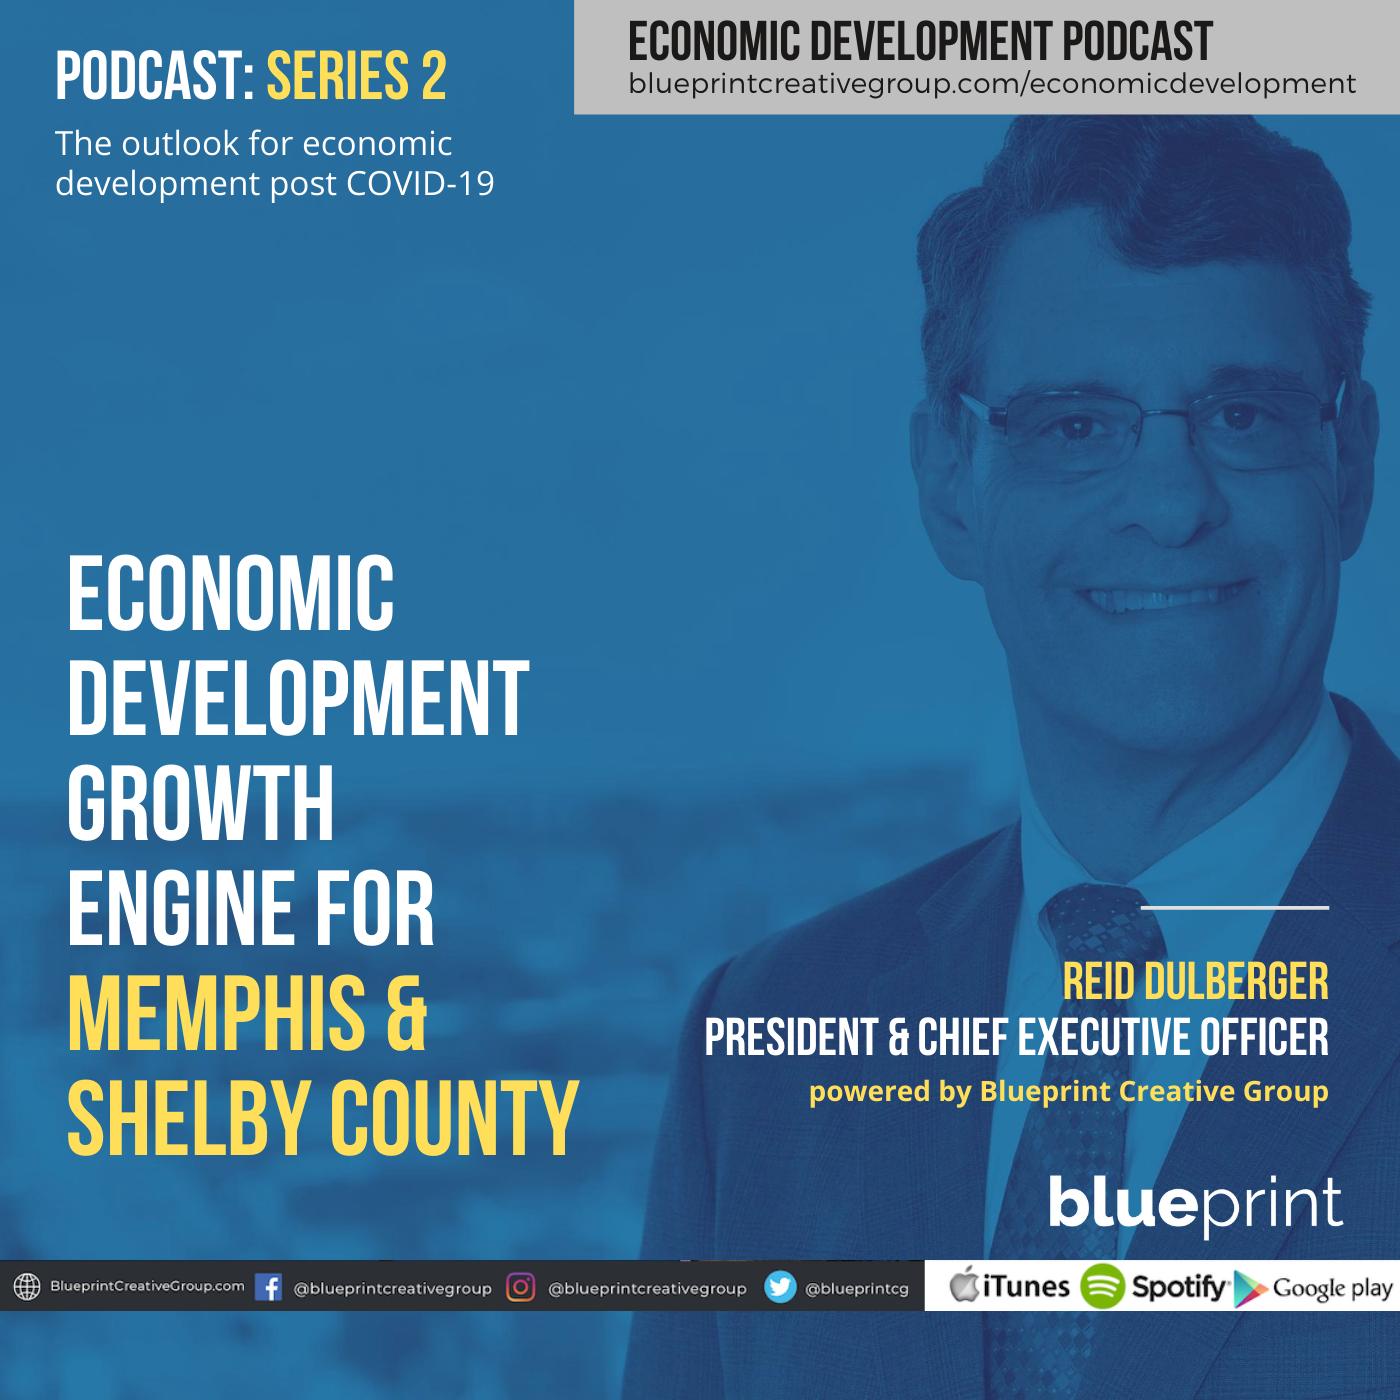 Reid Dulberger, Reid Dulberger, Economic Development Growth Engine for Memphis & Shelby County